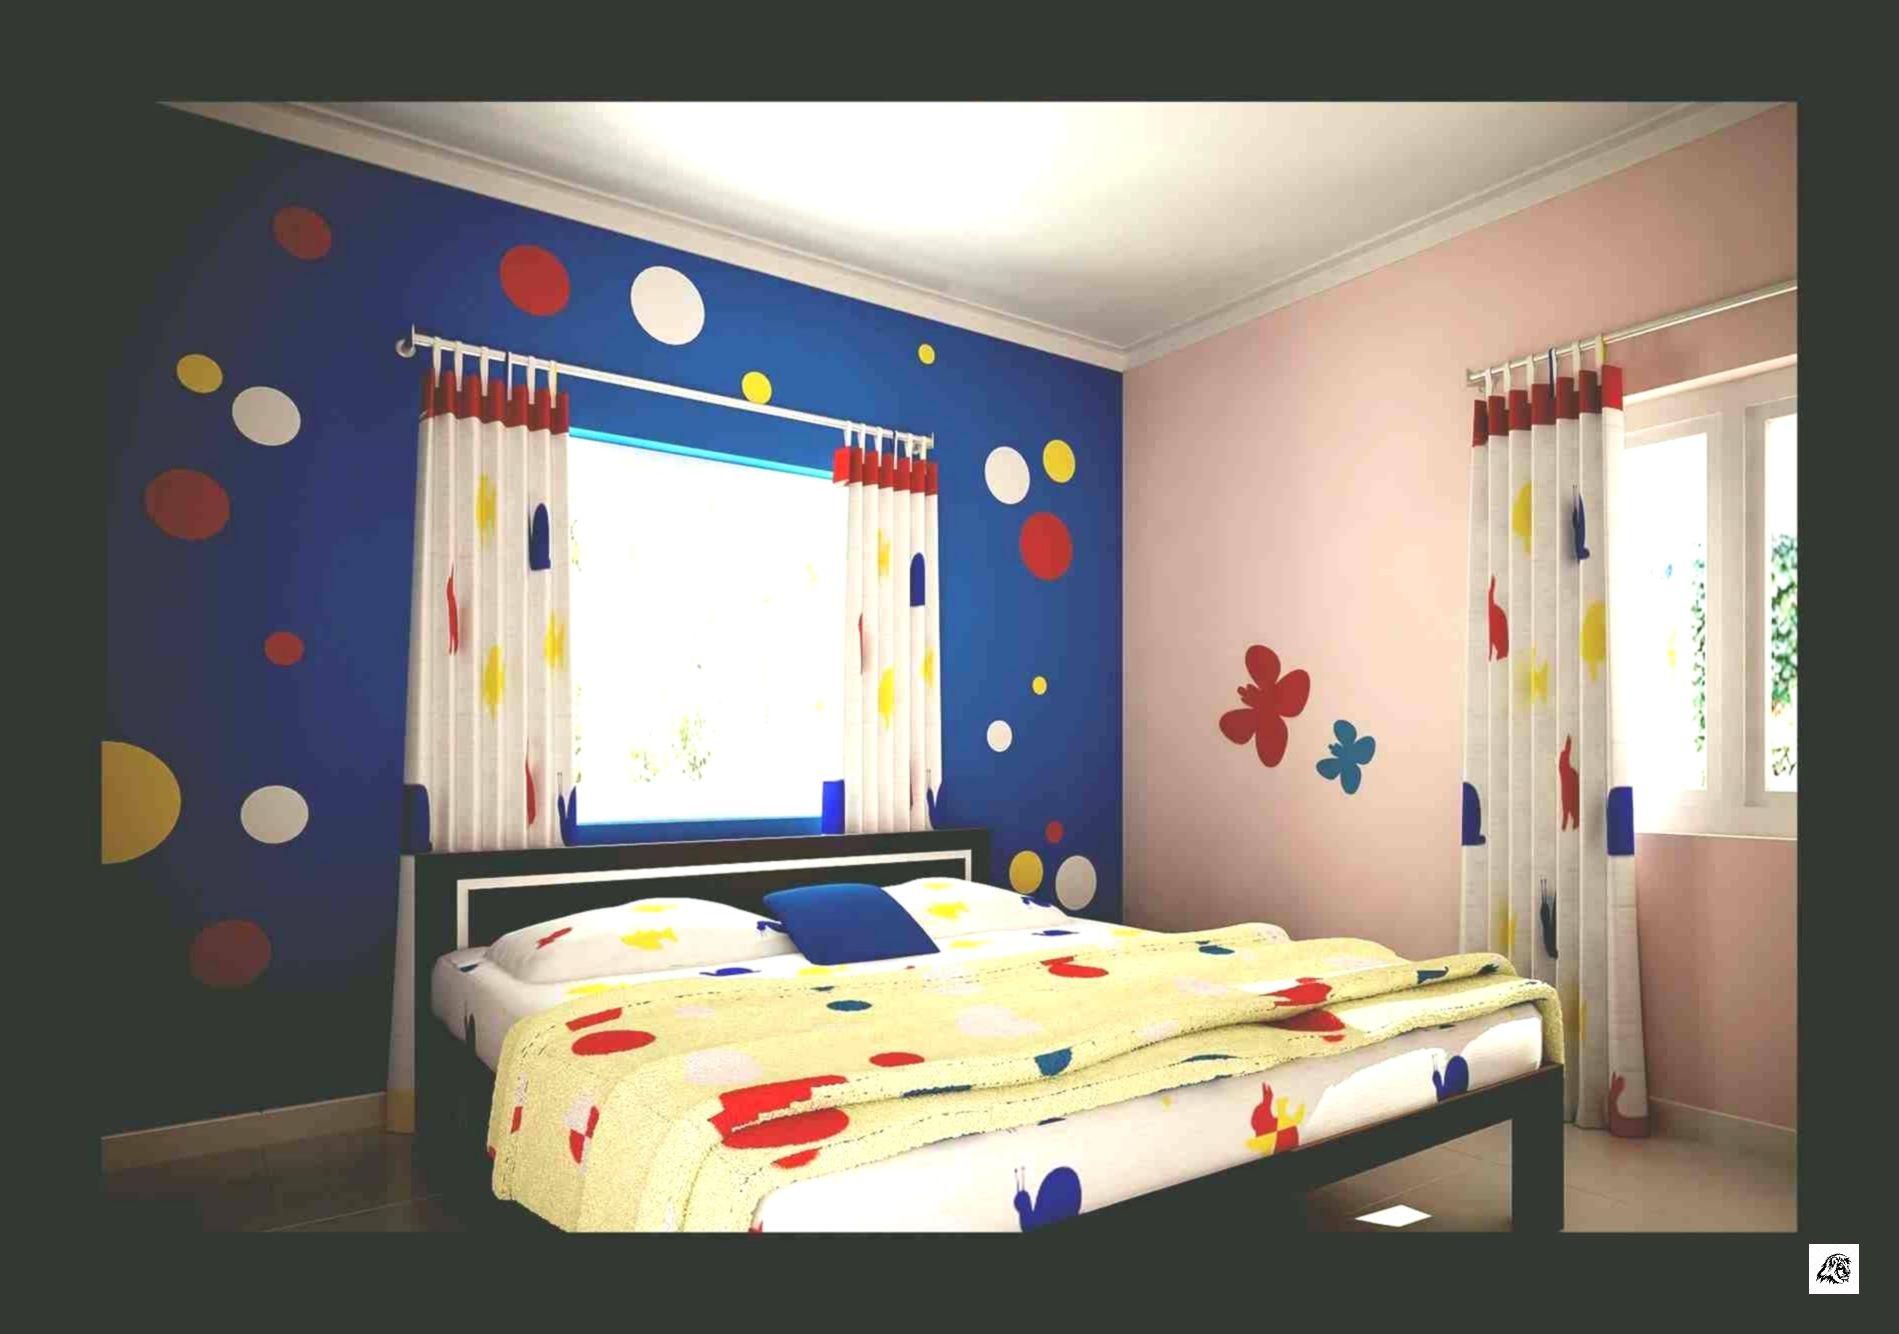 My Bedroom Design Home Designer Games Luxury Bedroom Design Game